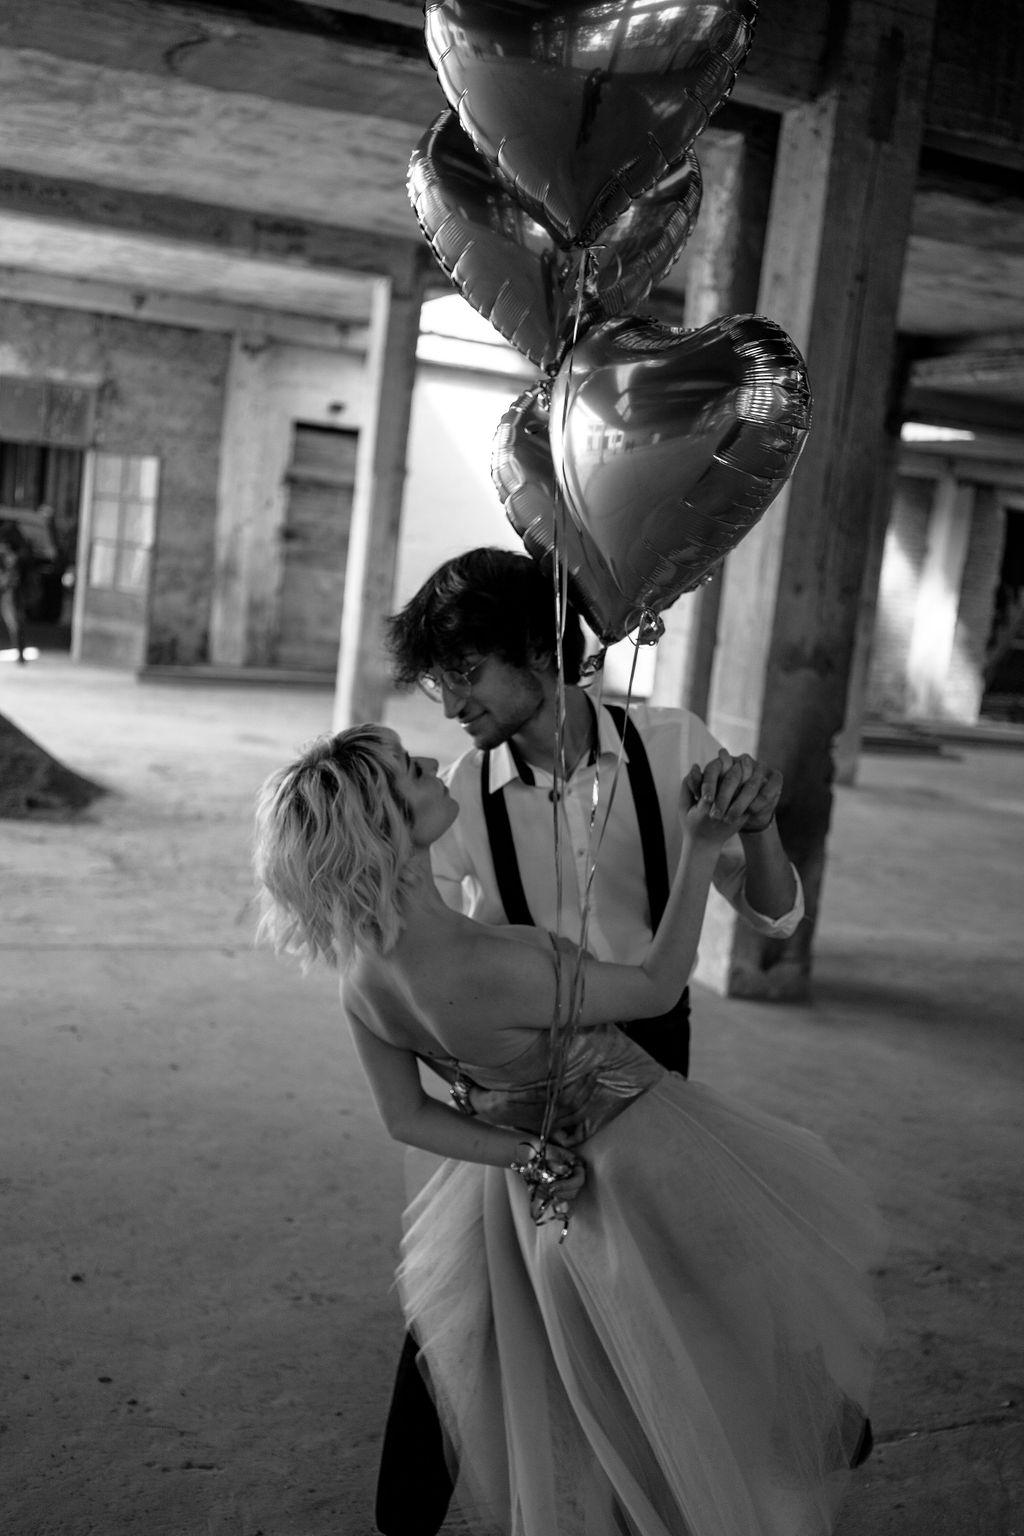 heart shaped wedding balloons - creative wedding photography - modern industrial wedding - alternative wedding - unconventional wedding - edgy wedding